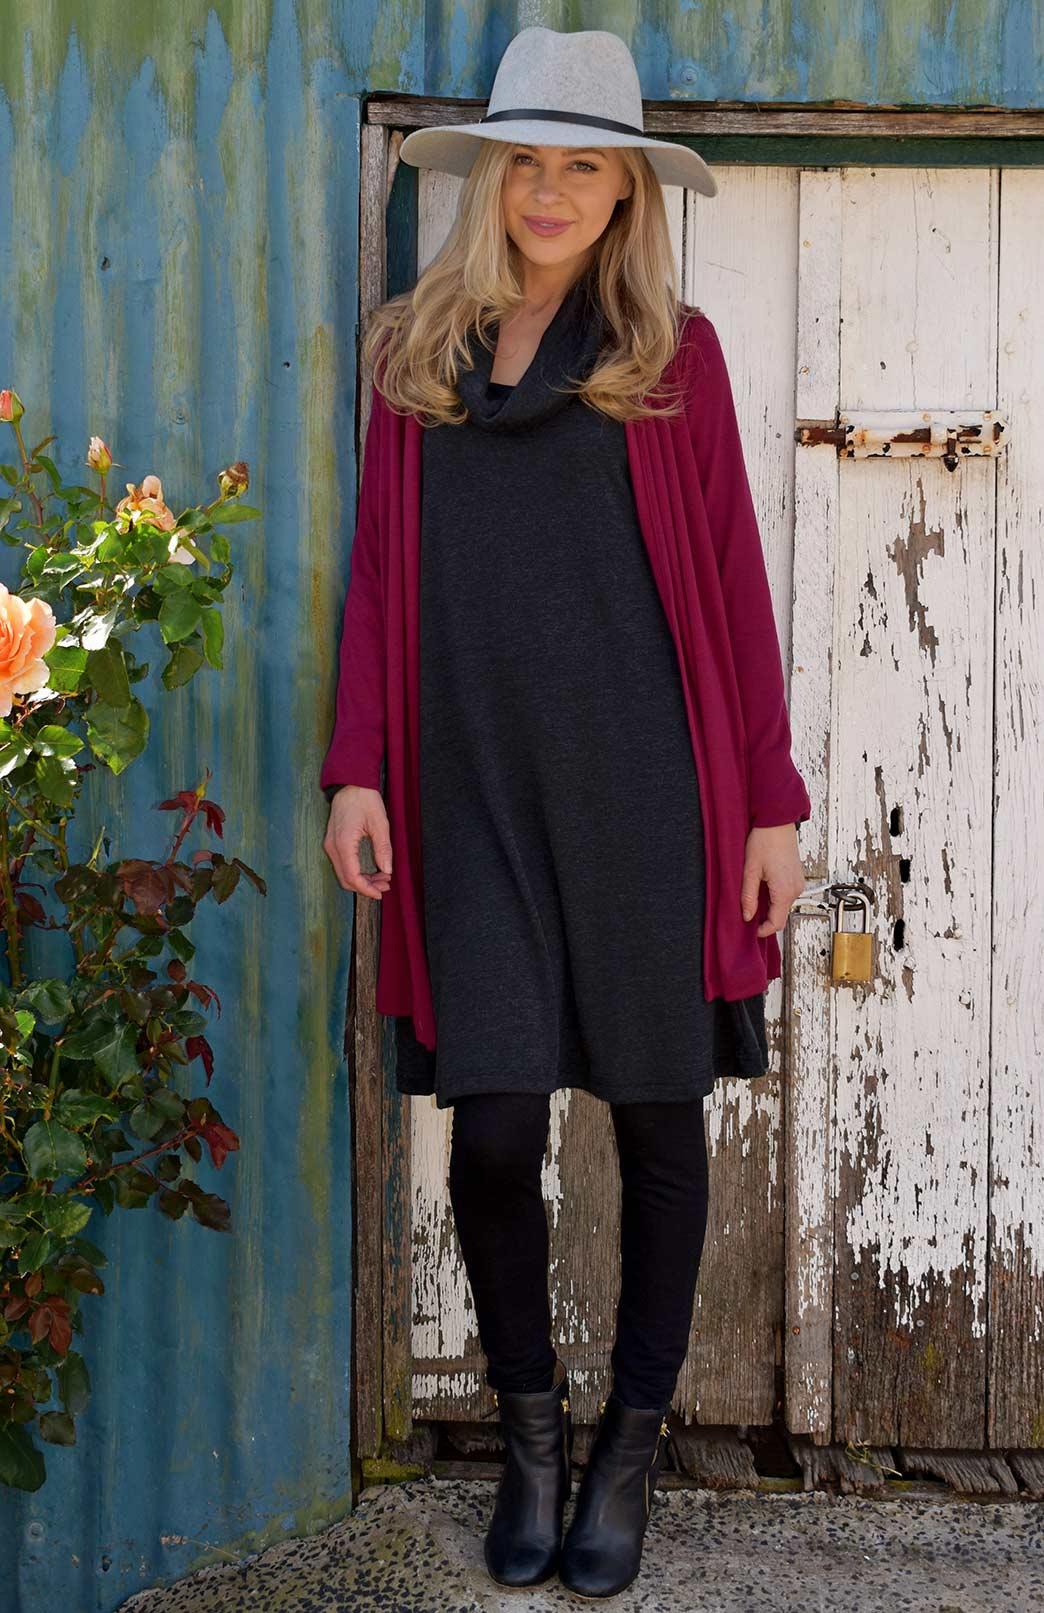 Cowl Neck Swing Dress - Women's Superfine Merino Wool Long Sleeve Cowl Neck Swing Dress - Smitten Merino Tasmania Australia